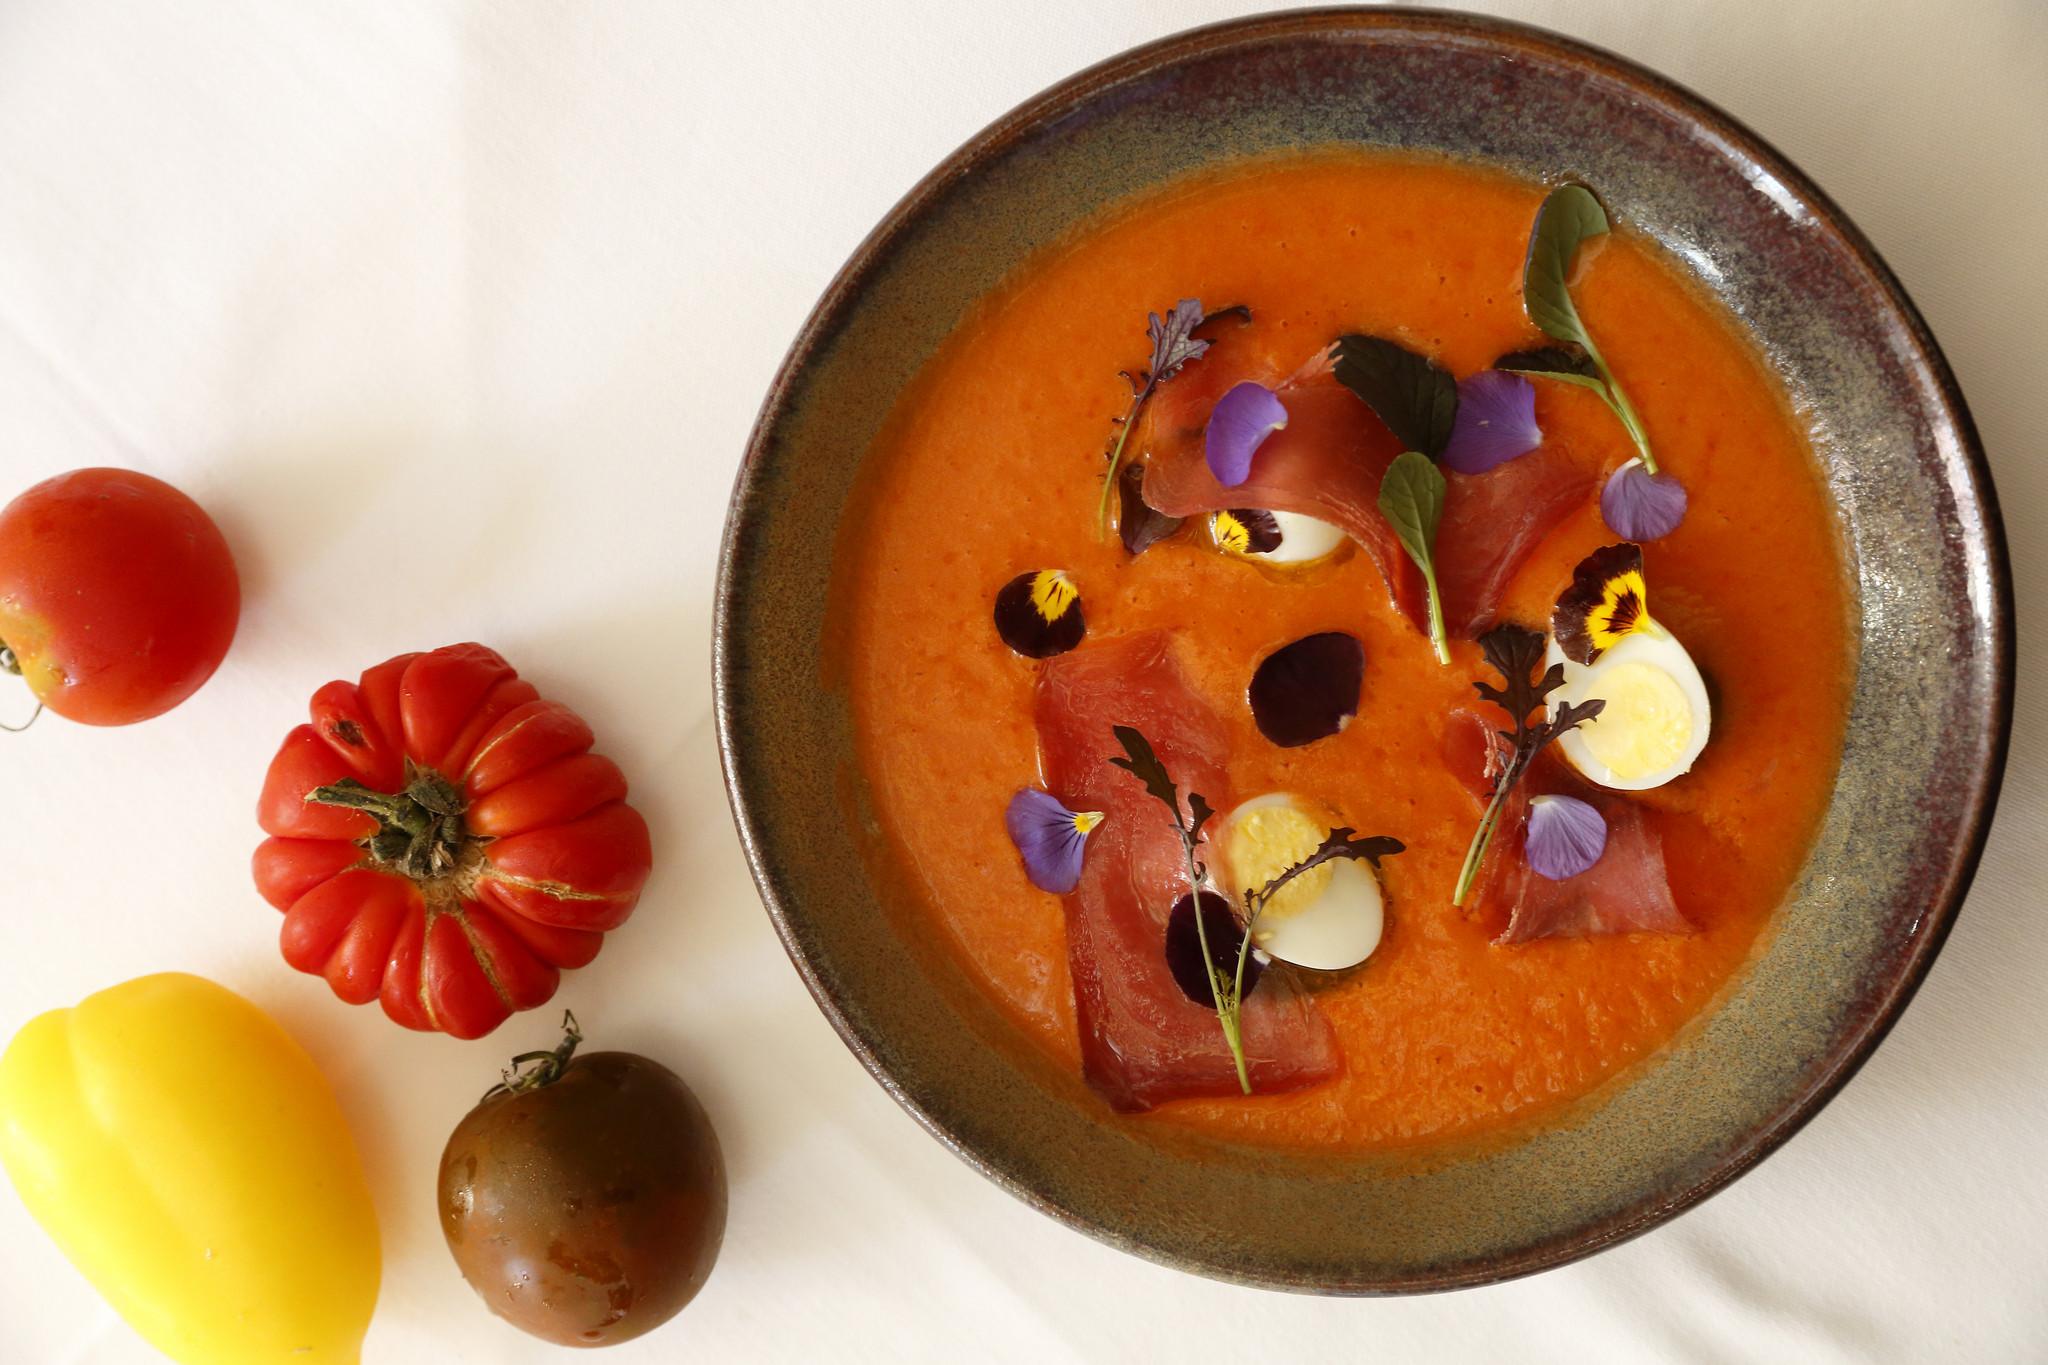 MJ Casa de Pasto sopa de tomate 01.JPG